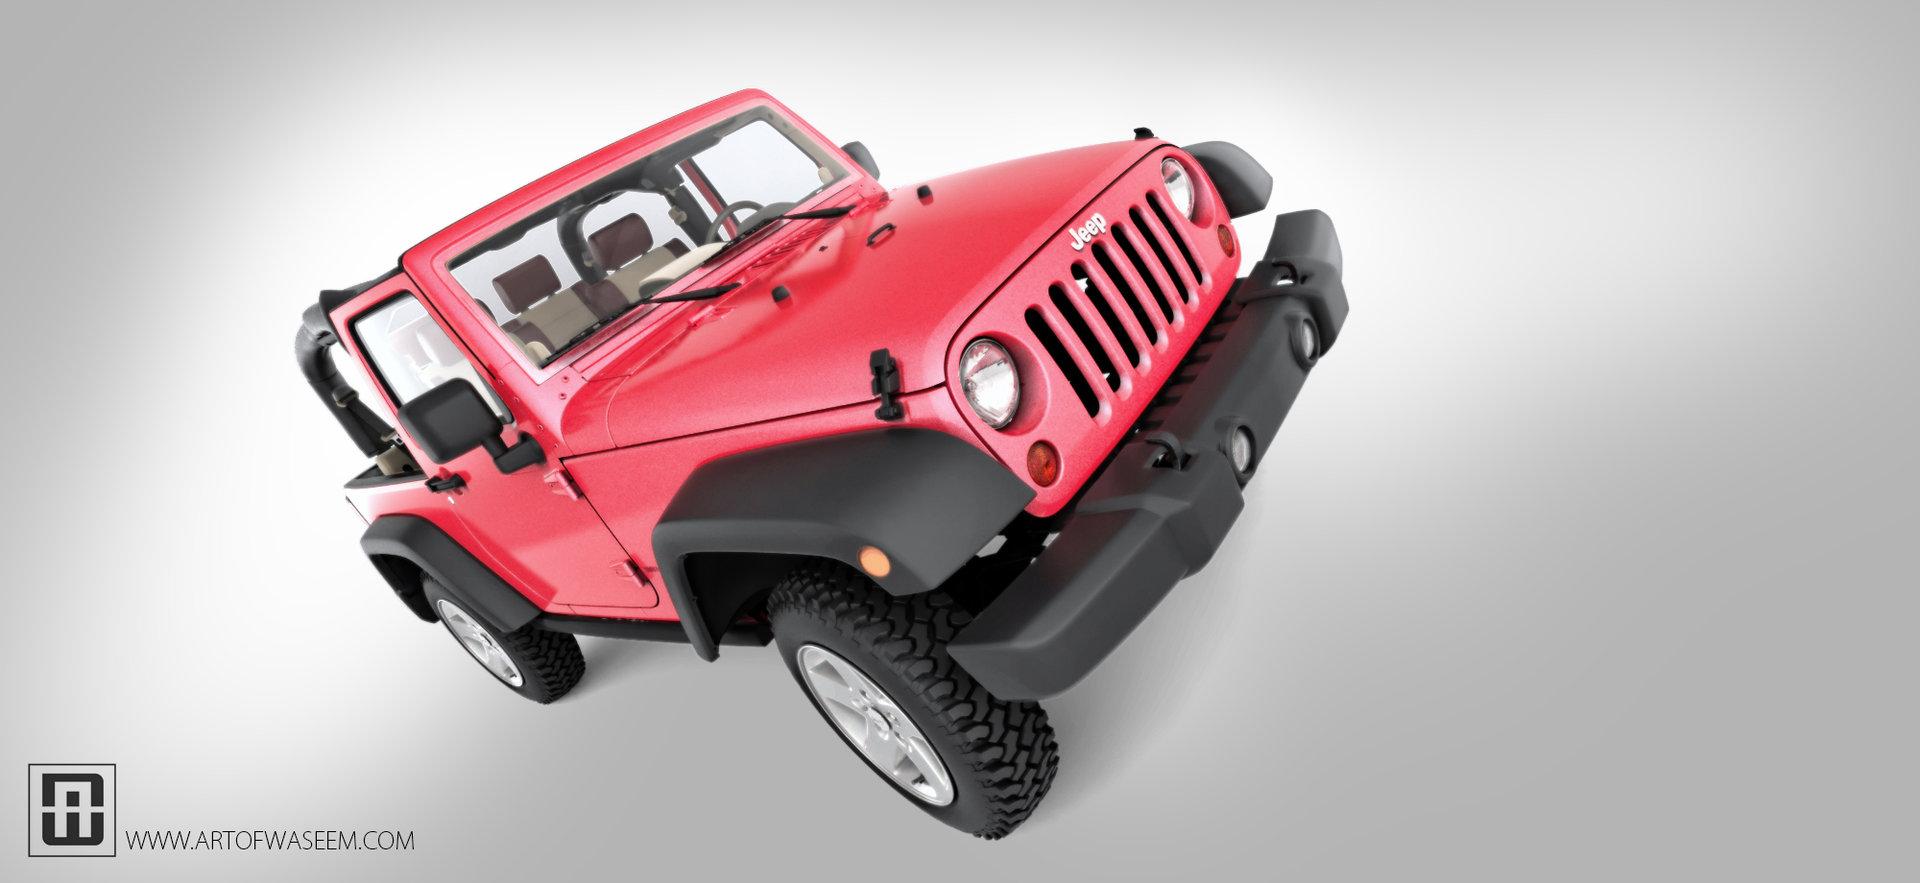 Muhammad waseem jeep wrangler 3 zps076b67cf